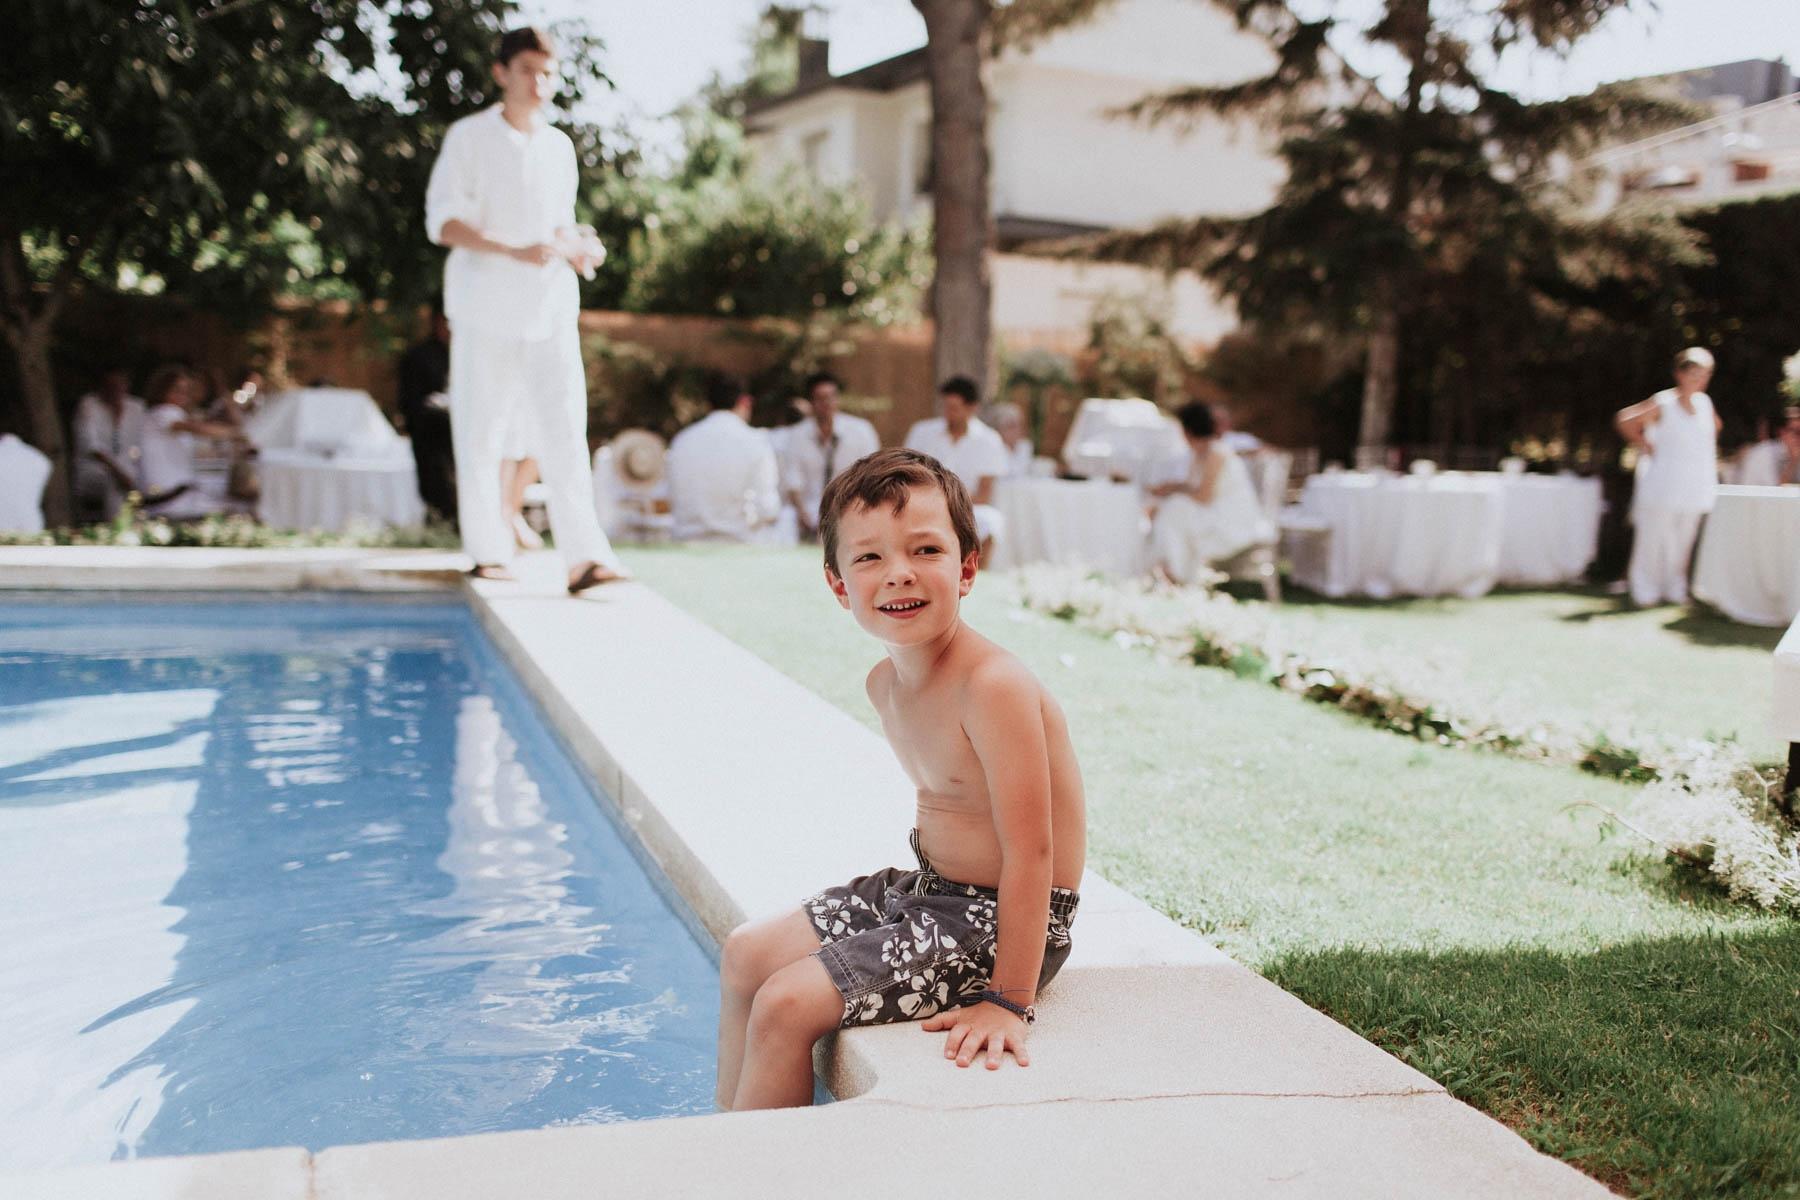 fotografo de bodas Jairo Crena-33